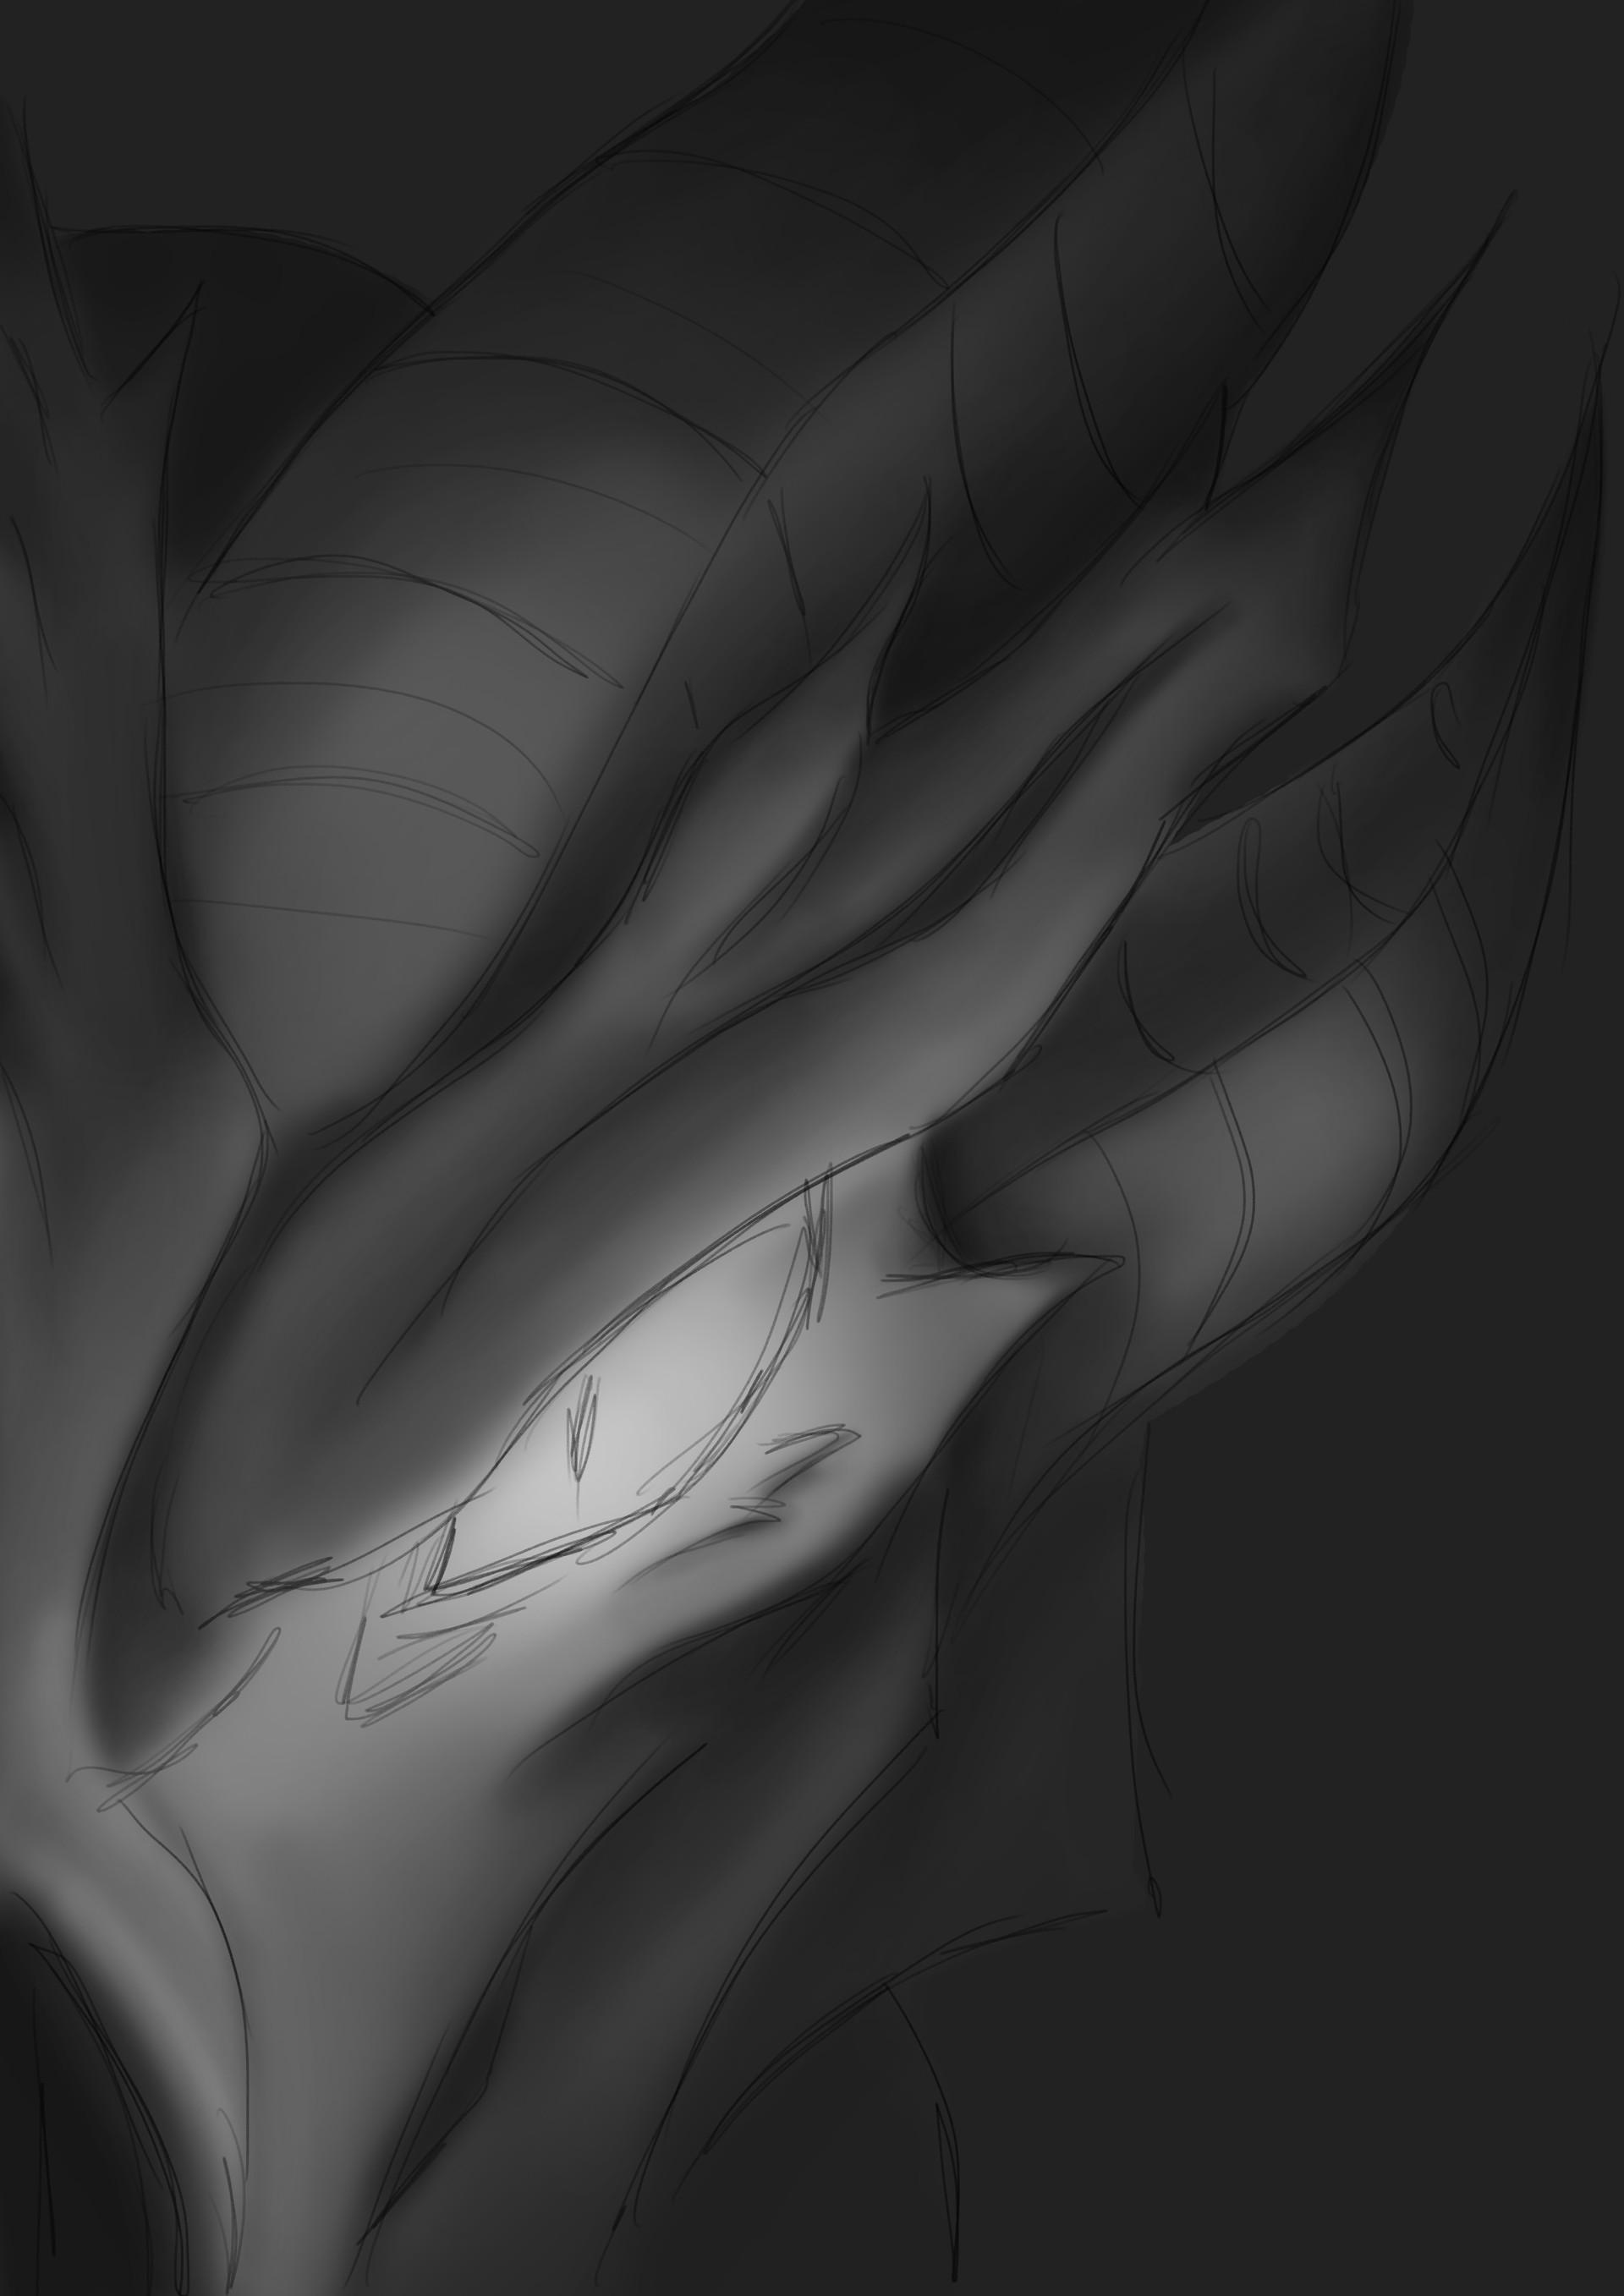 Digi nana demon5